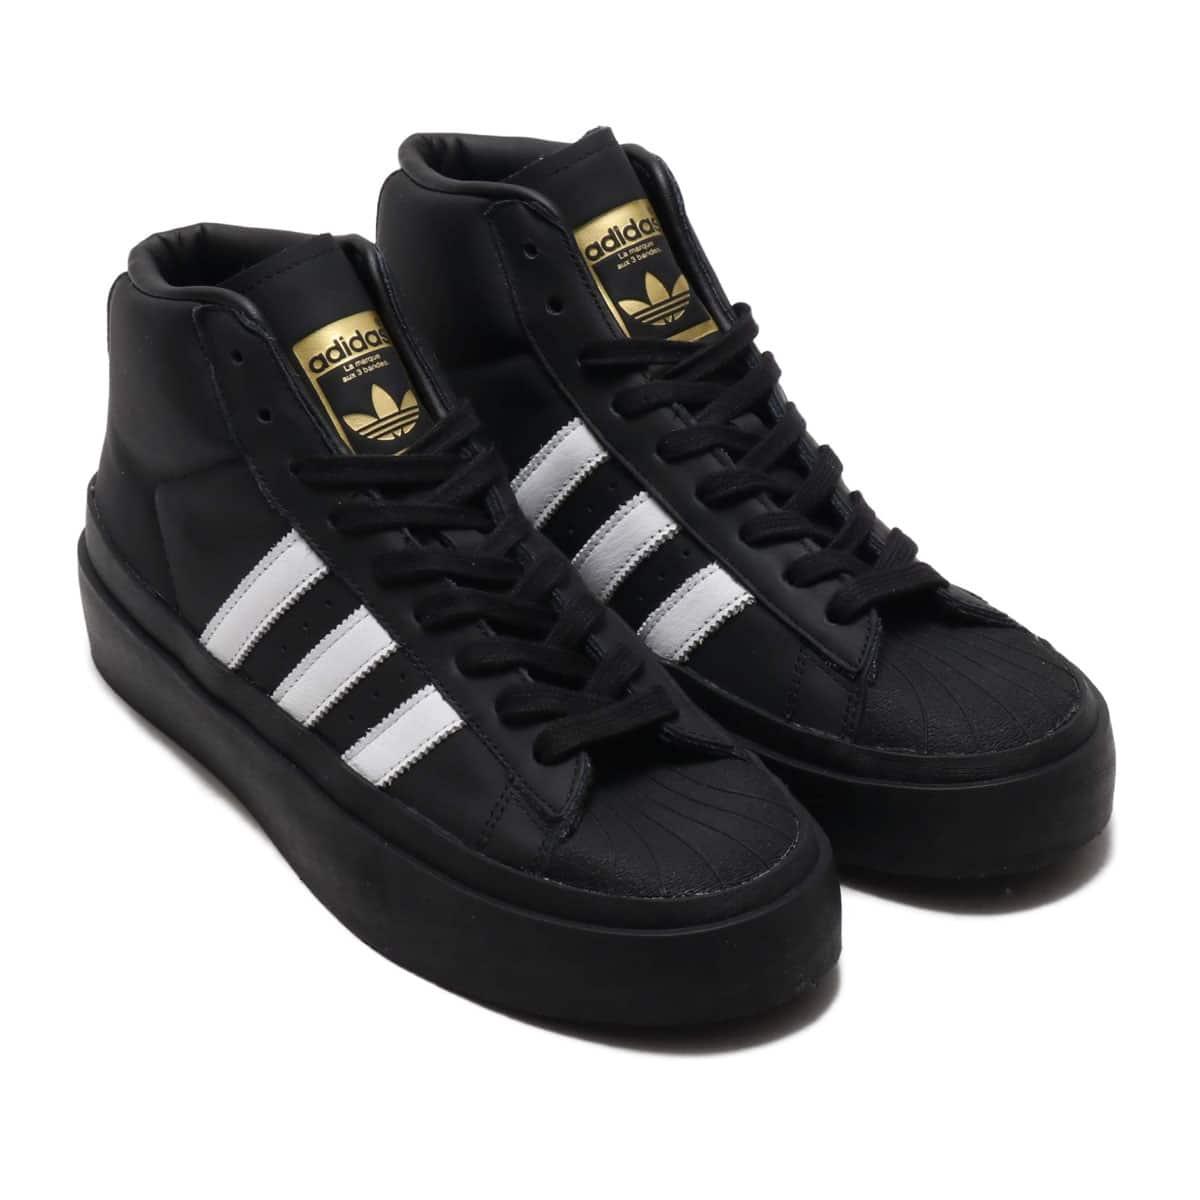 adidas 424 PRO MODEL BLACK/BLACK/WHITE 20SS-S_photo_large